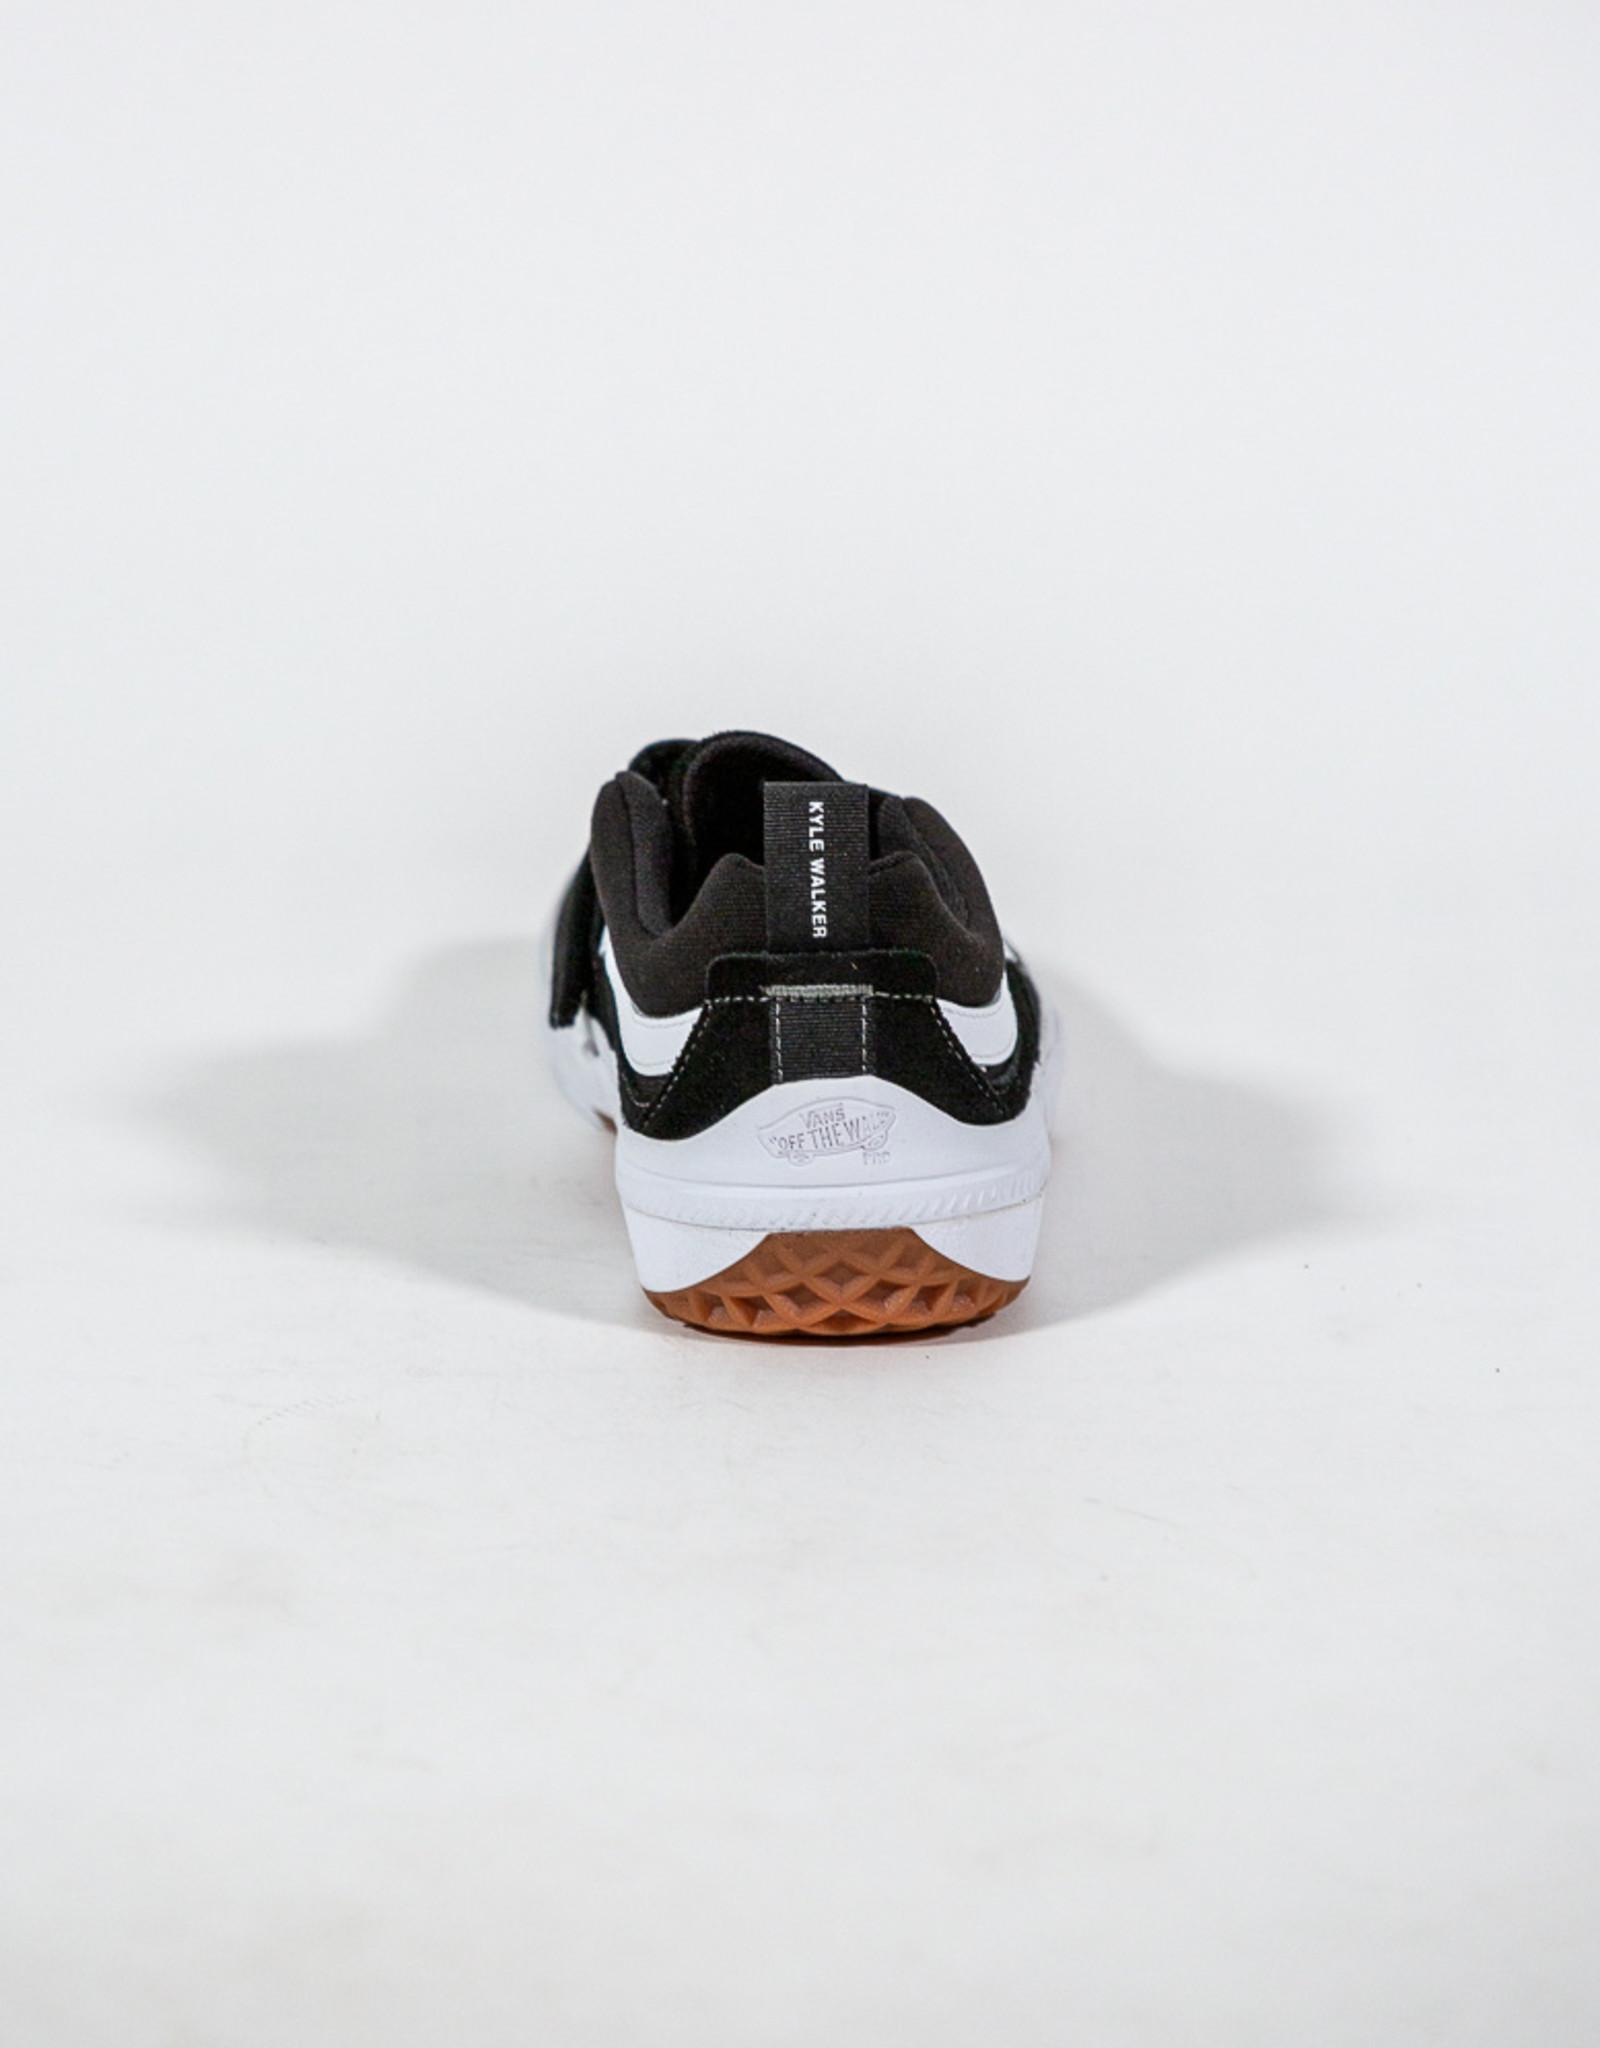 VANS VANS KYLE PRO 2 - BLACK/WHITE